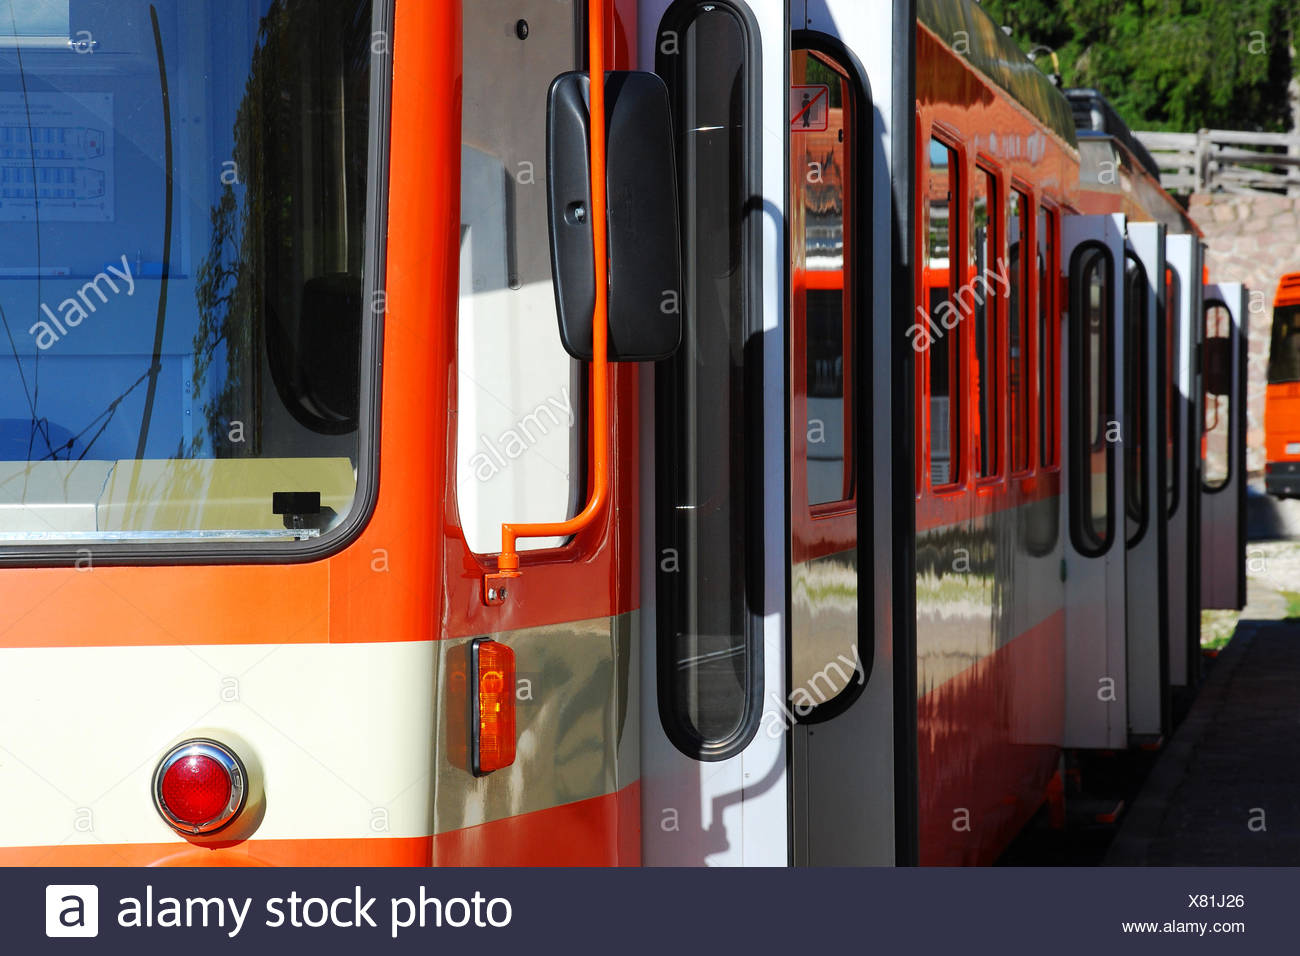 Train with open doors - Stock Image